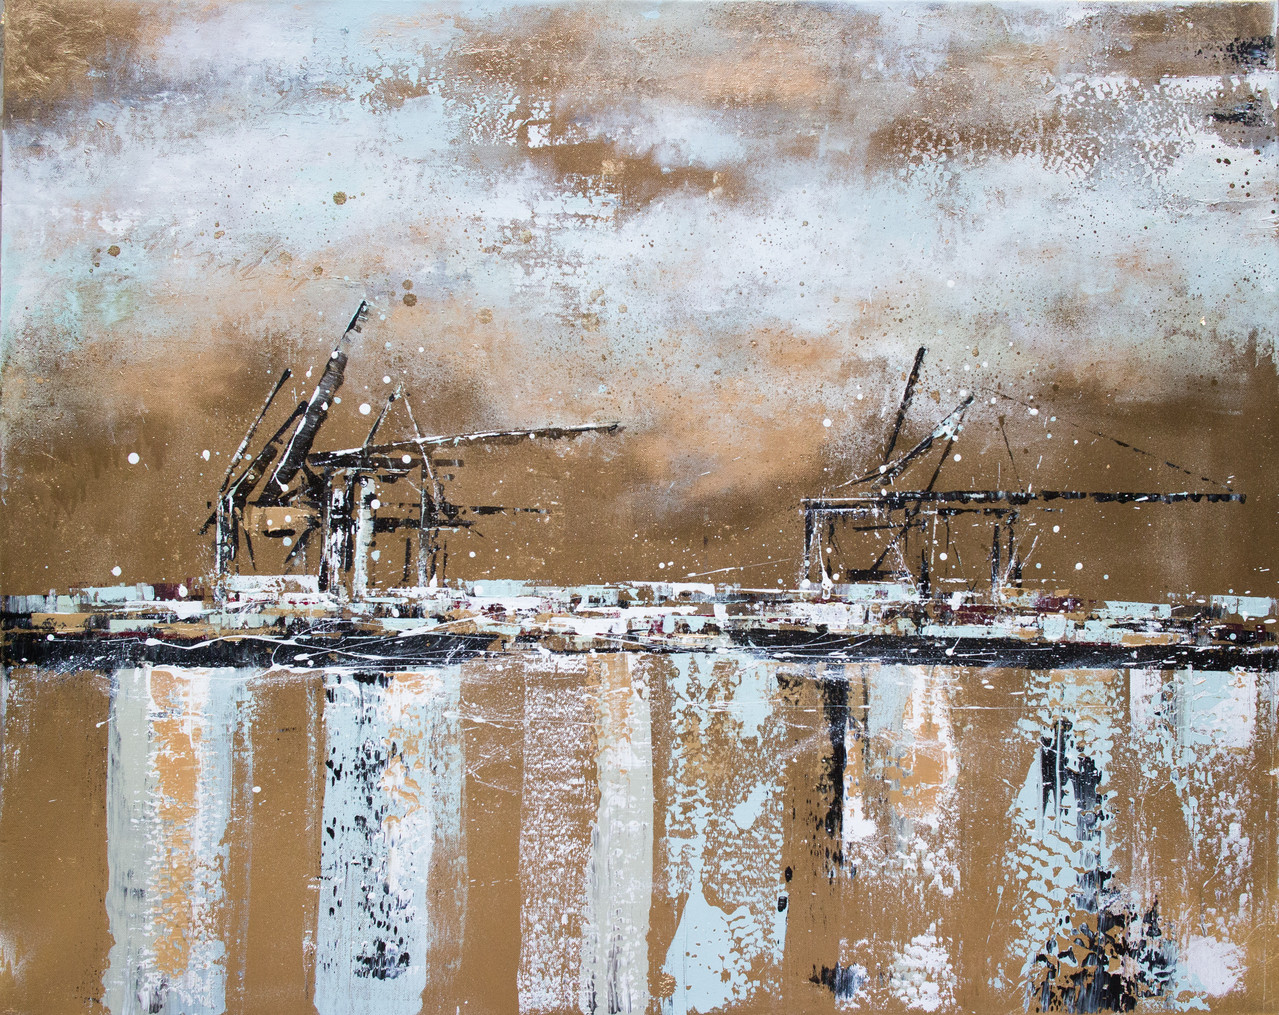 Gold II, 60 cm x 80 cm, Goldlack und Acryl auf Leinwand, 2013